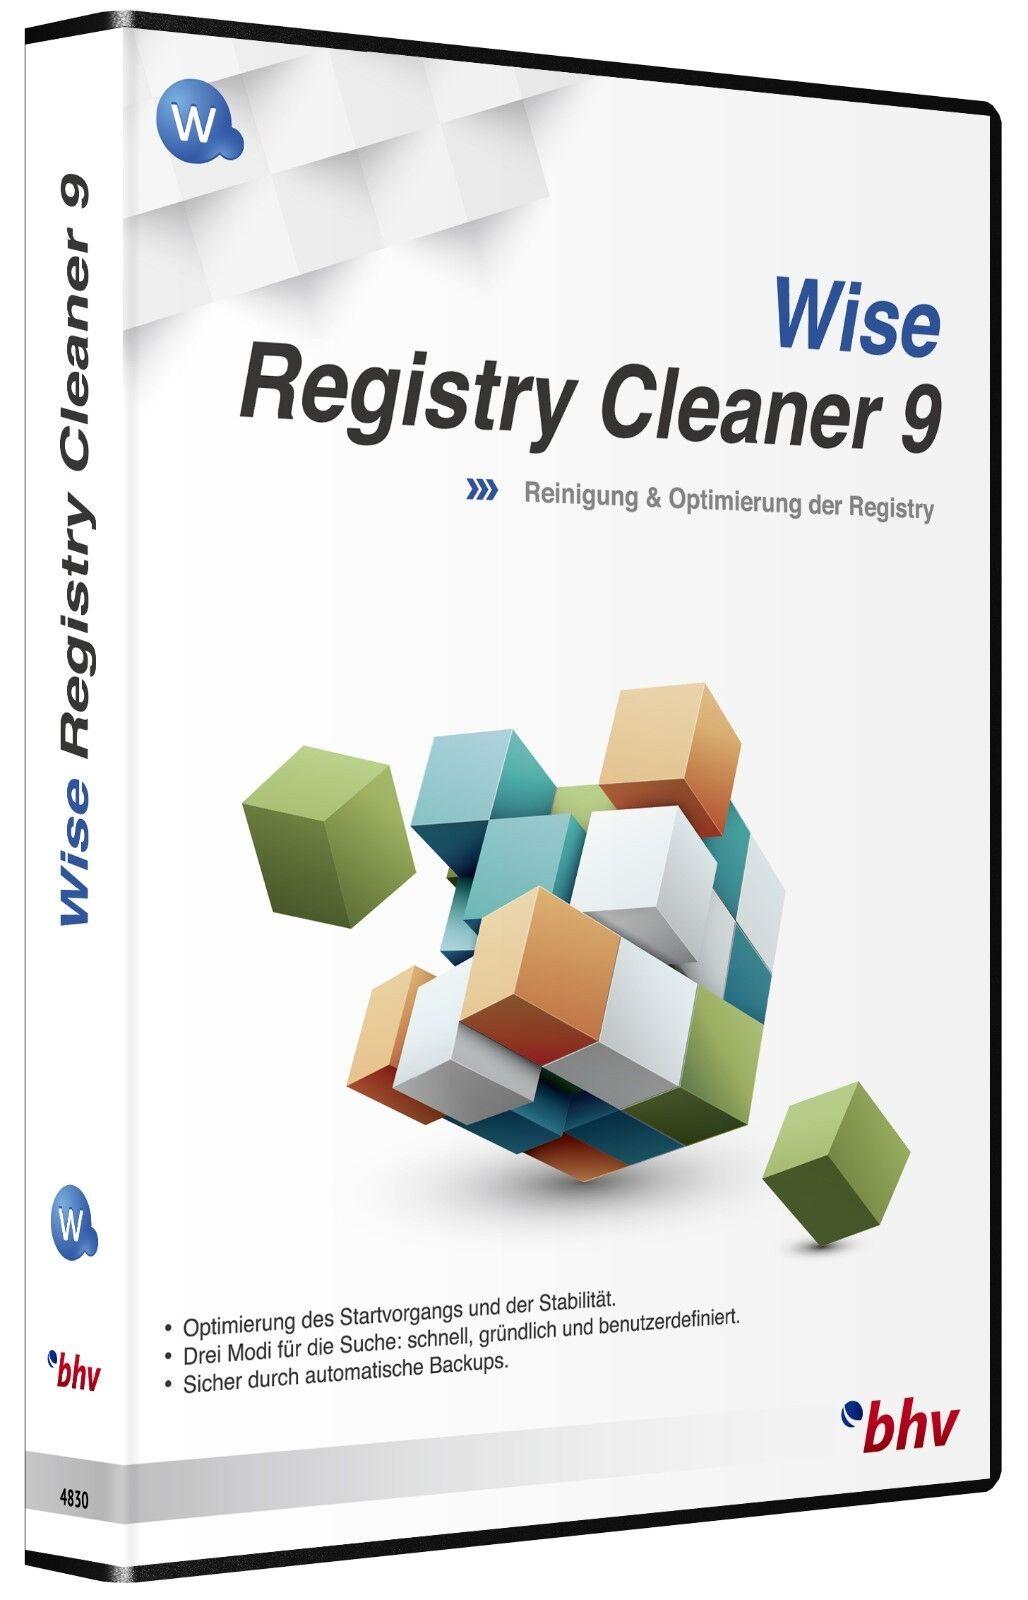 WISE Registry Cleaner 9